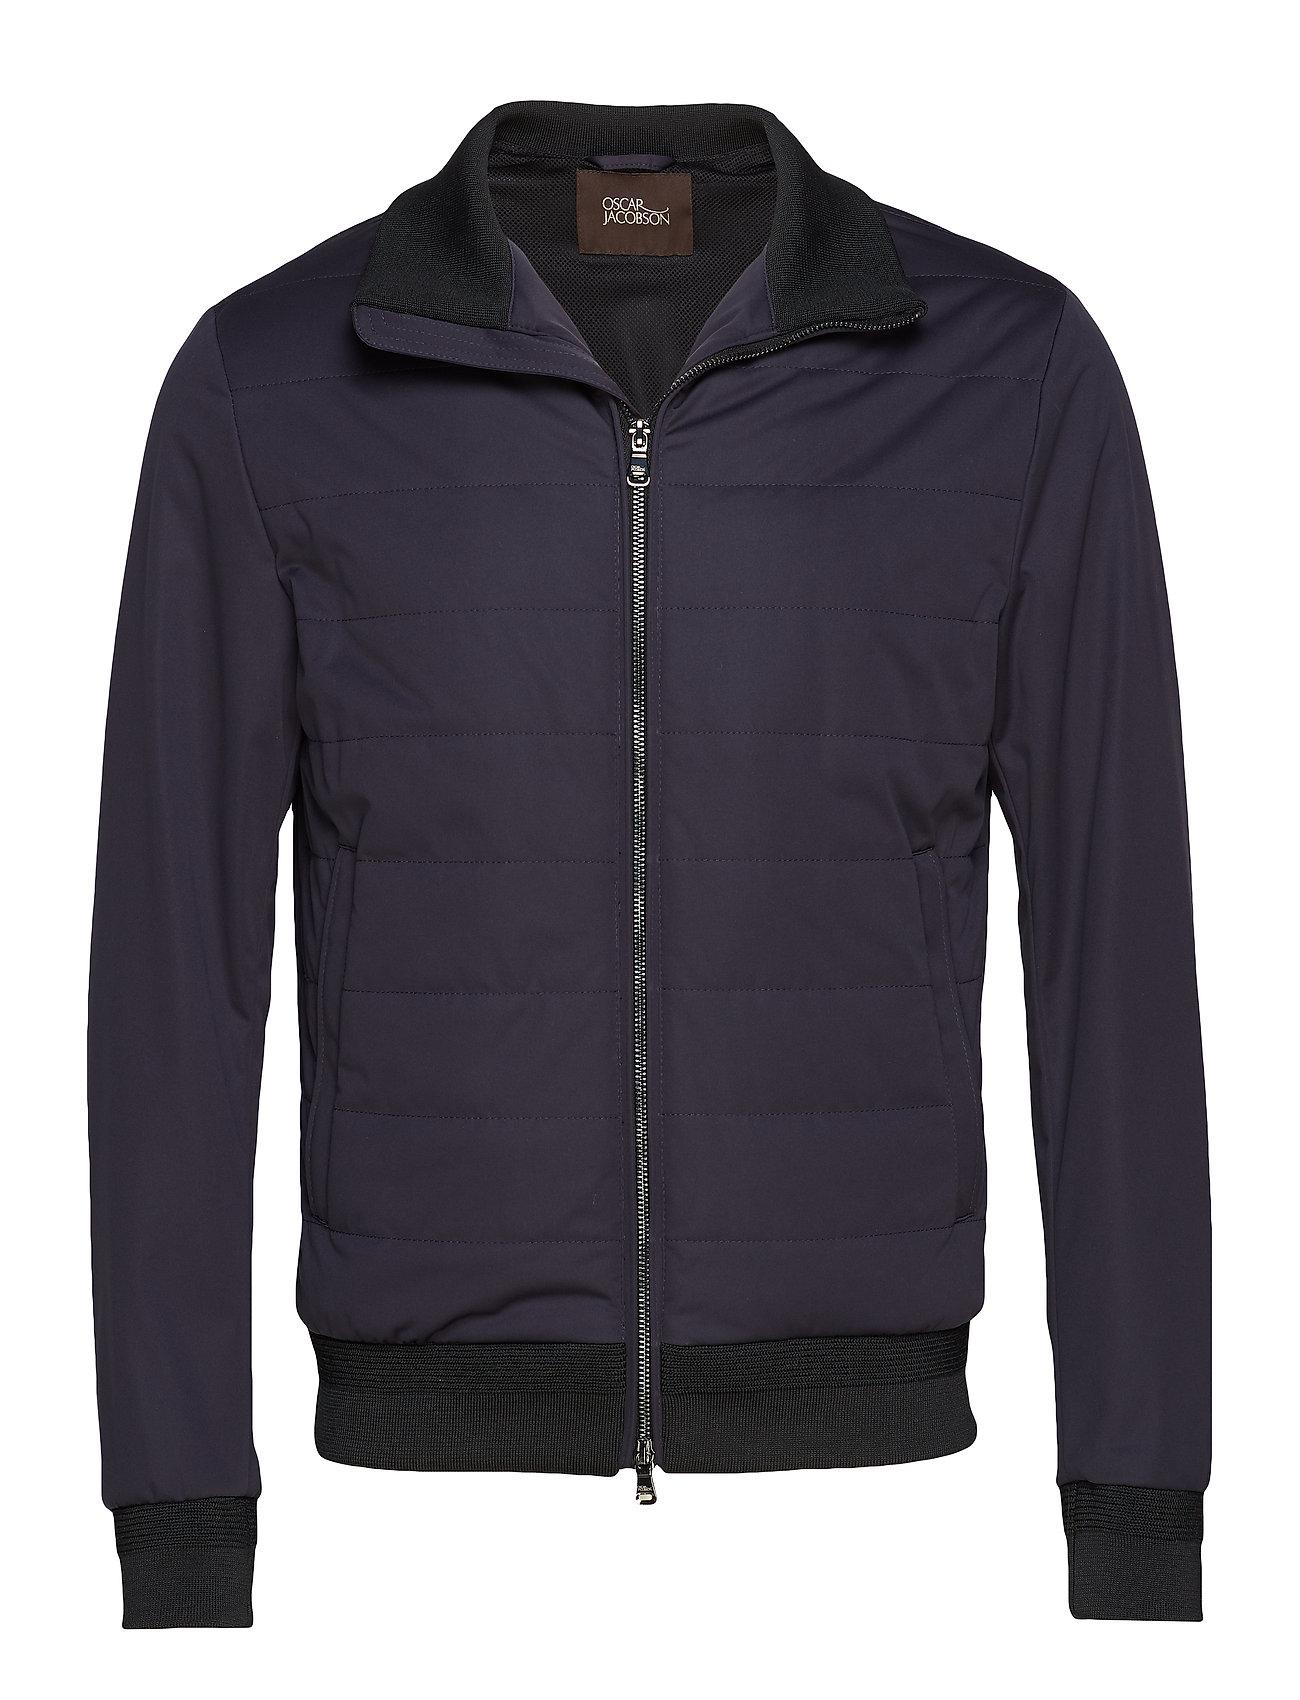 Oscar Jacobson Holdan Jacket Ytterkläder